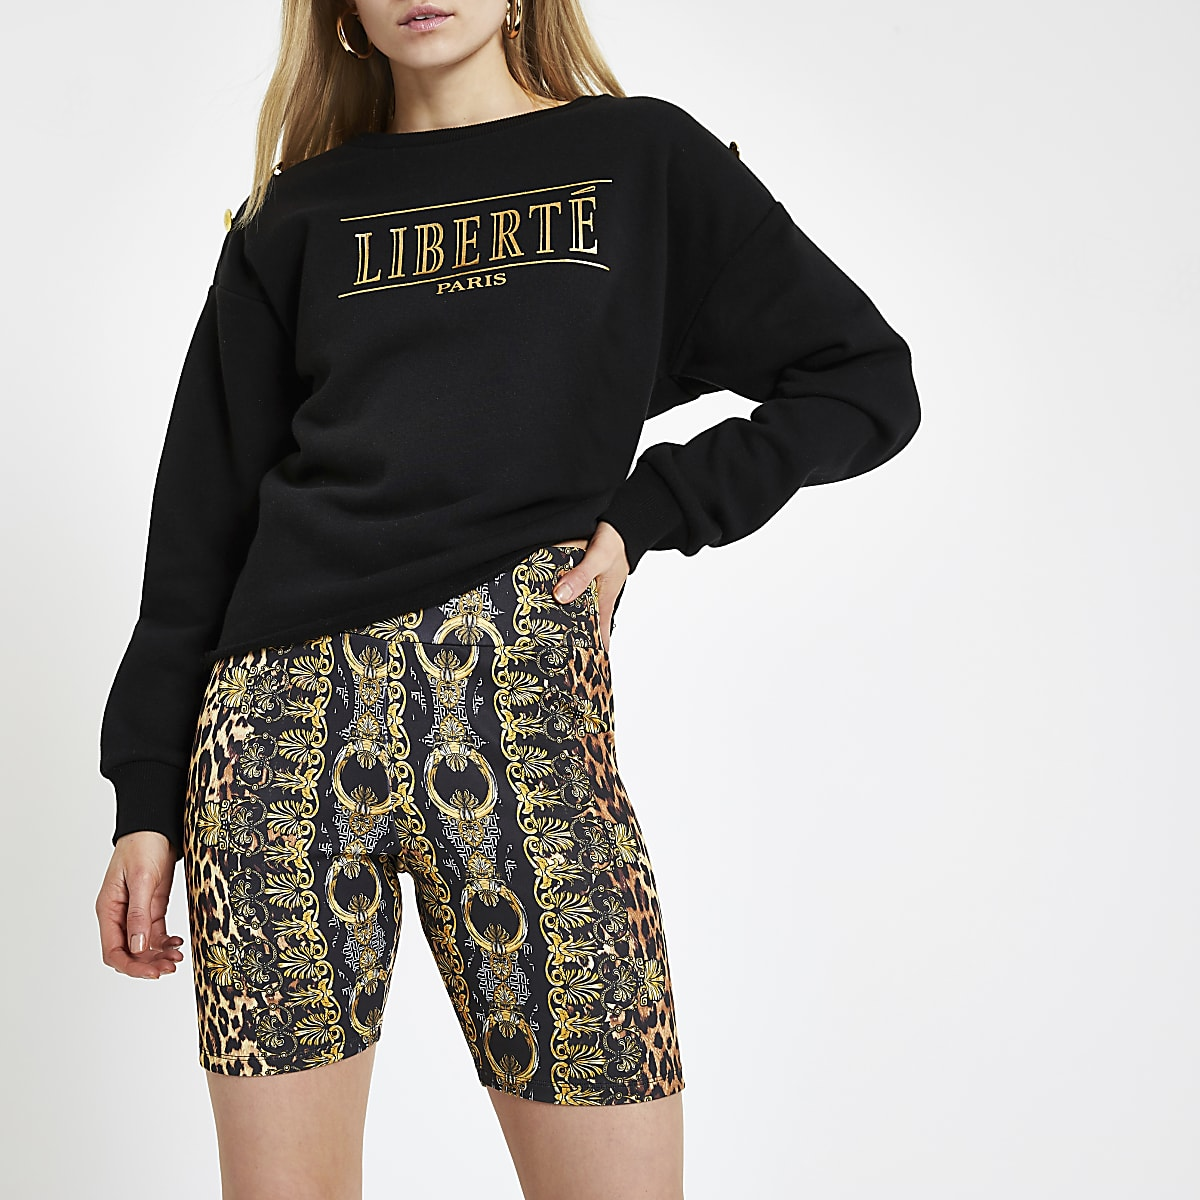 ad1e7a54cc Short cycliste à imprimé foulard léopard marron - Shorts casual ...